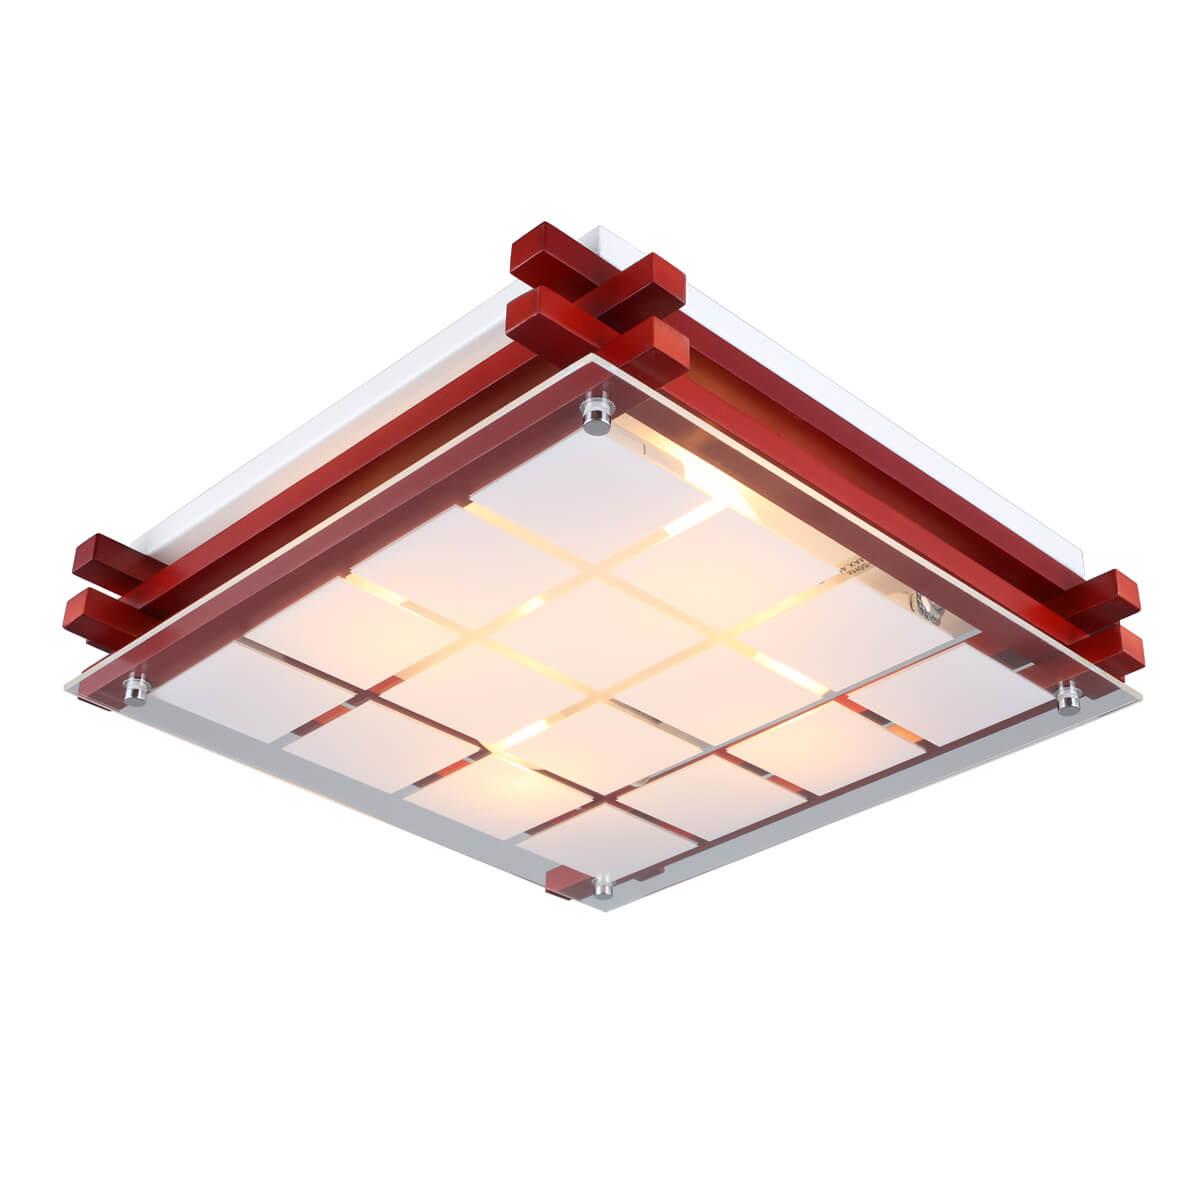 Настенный светильник Omnilux OML-40527-02 цены онлайн